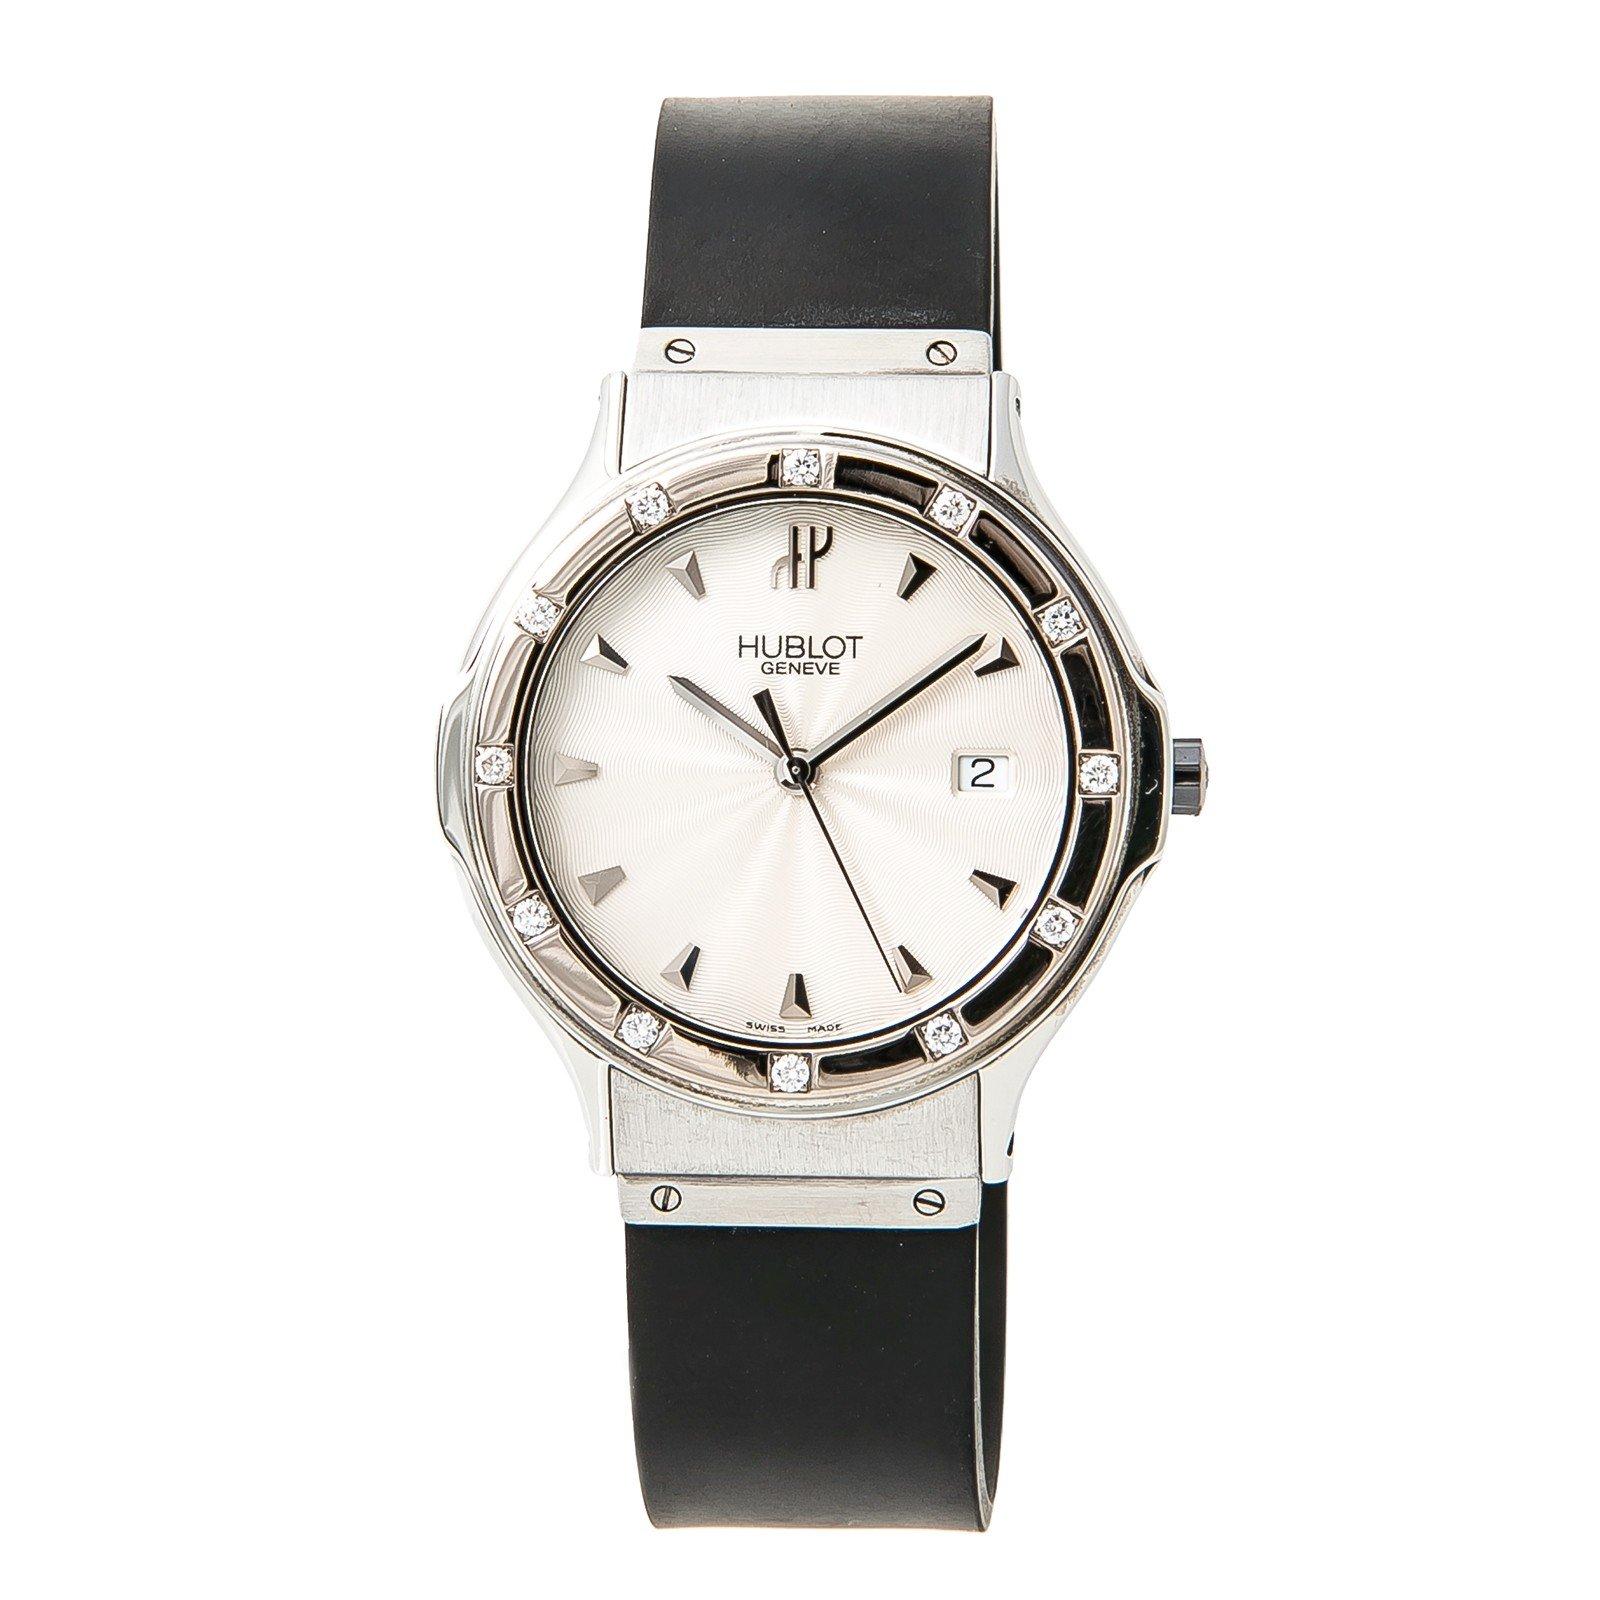 Hublot MDM quartz womens Watch 1525.11.044 (Certified Pre-owned)